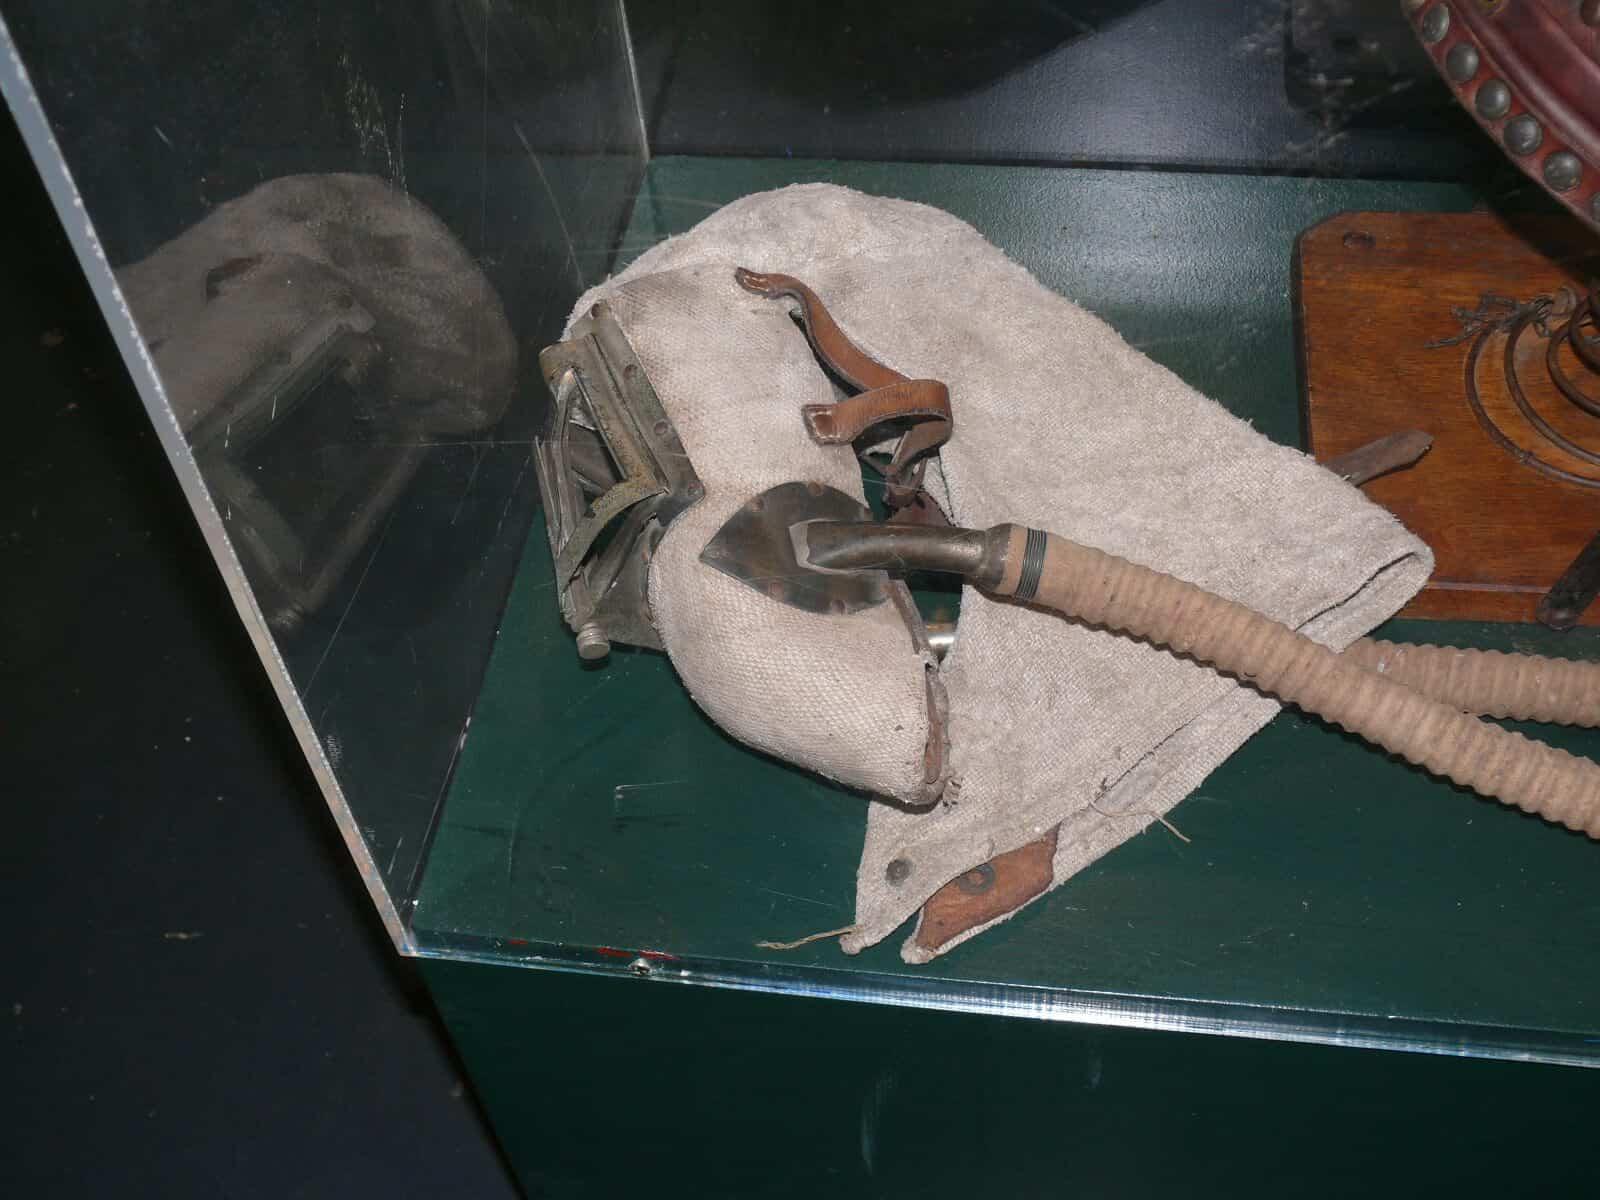 Asbestos Audits Queensland AAQ PL - Asbestos in Museums- Breathing Apparatus with Asbestos